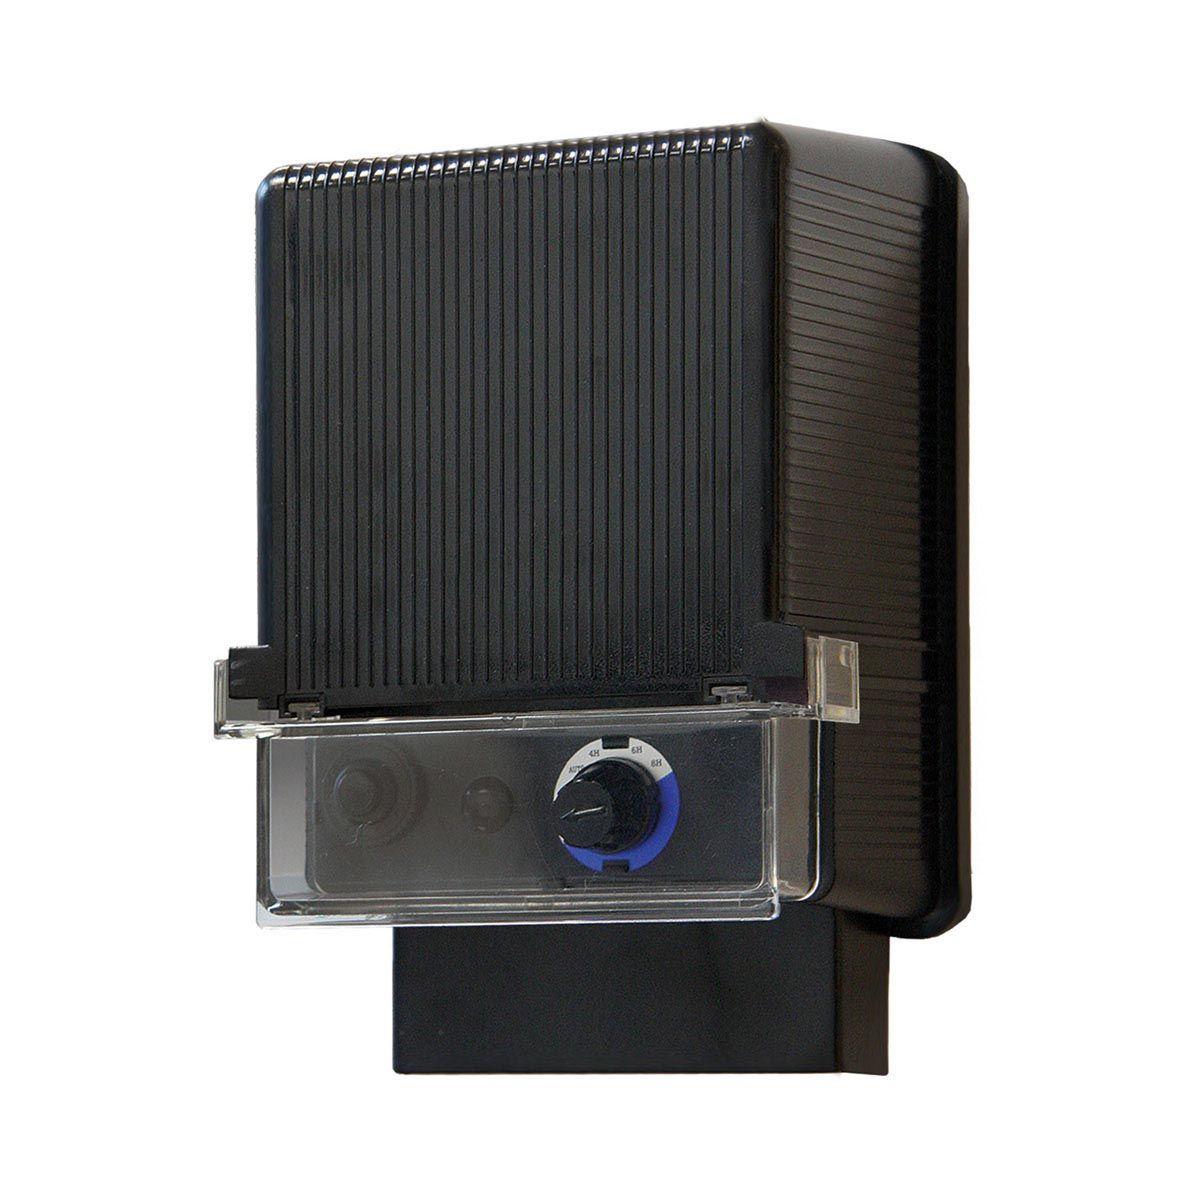 Transformator, inkl. Timer und Lichtsensor, 60 W